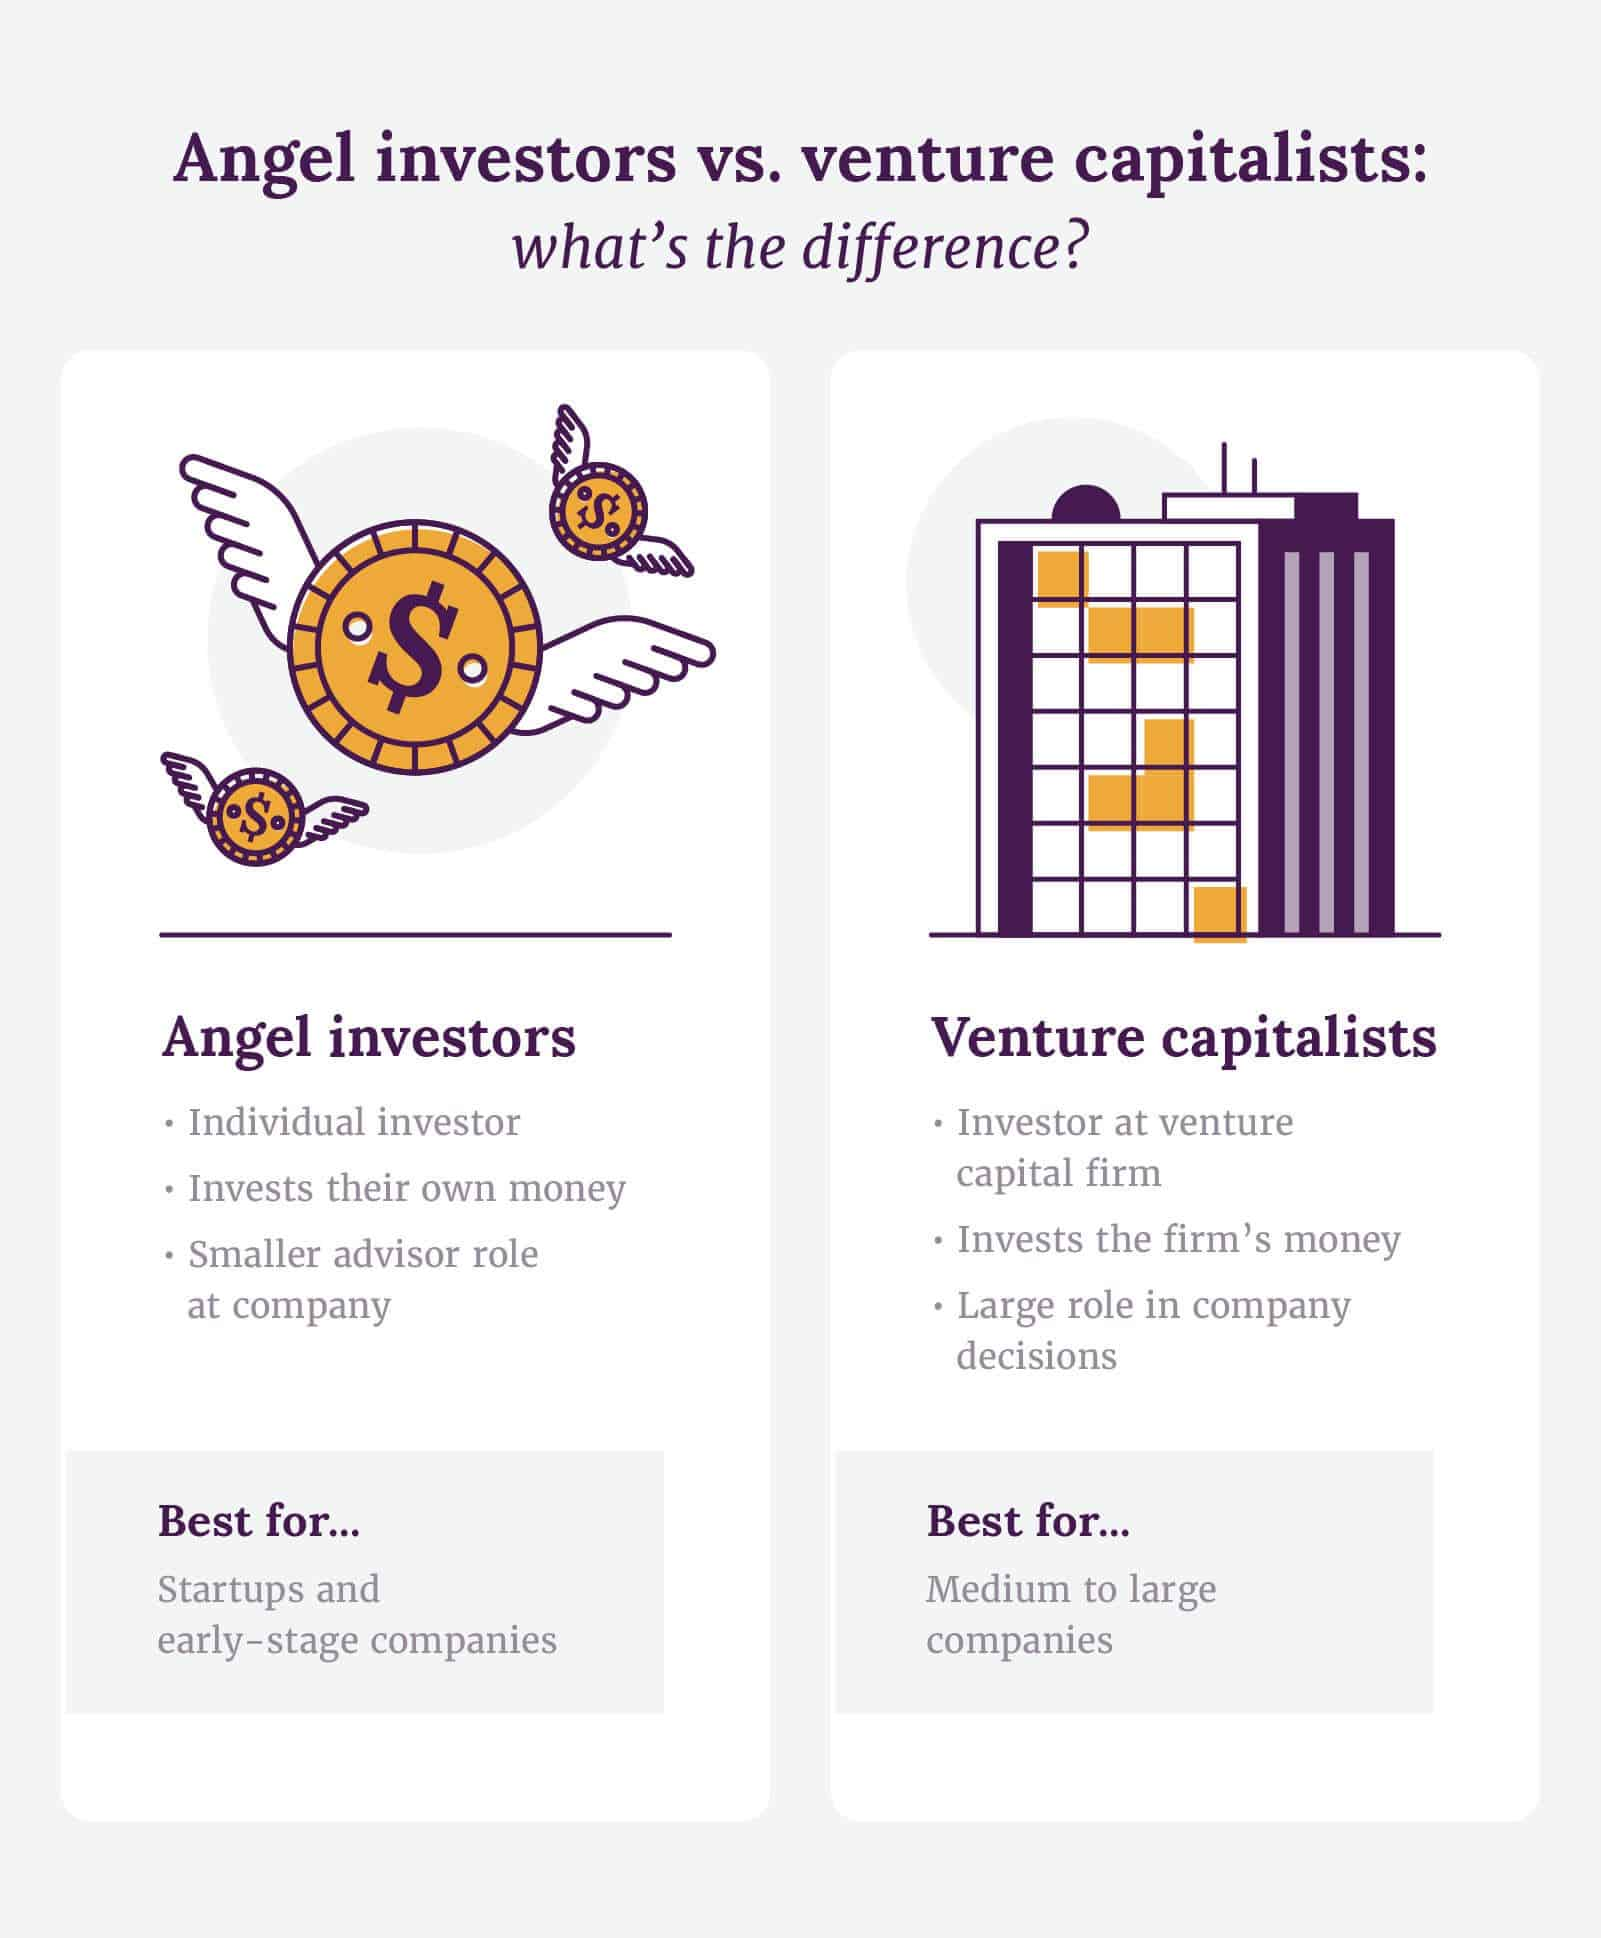 Angel investors vs. venture capitalists